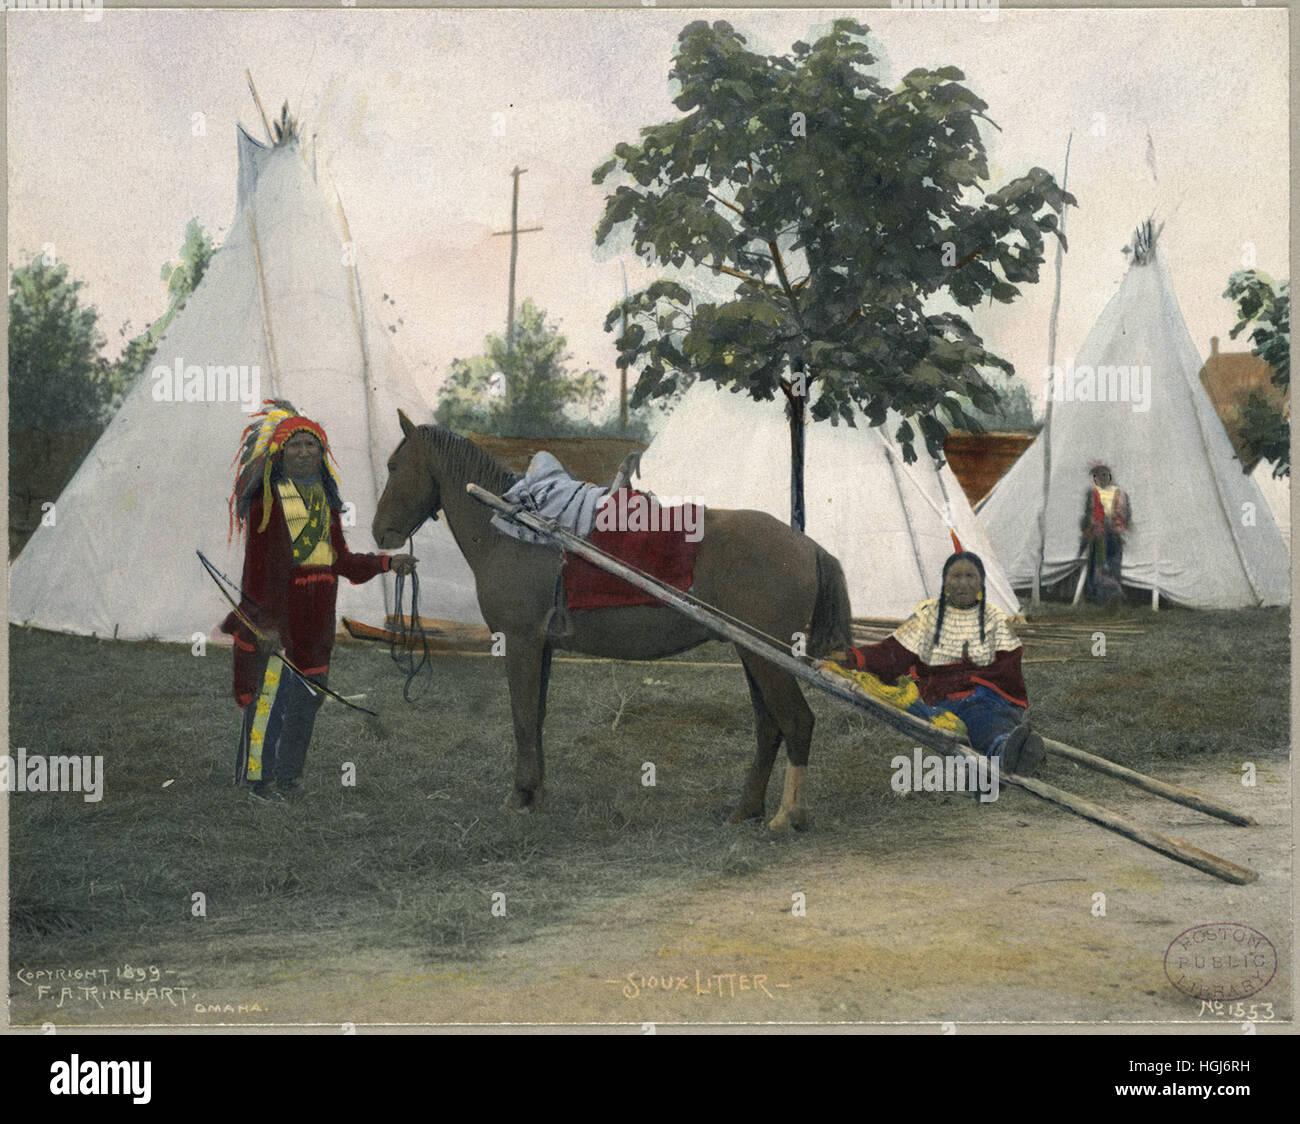 Sioux Litter   - 1898 Indian Congress - Photo : Frank A. Rinehart - Stock Image